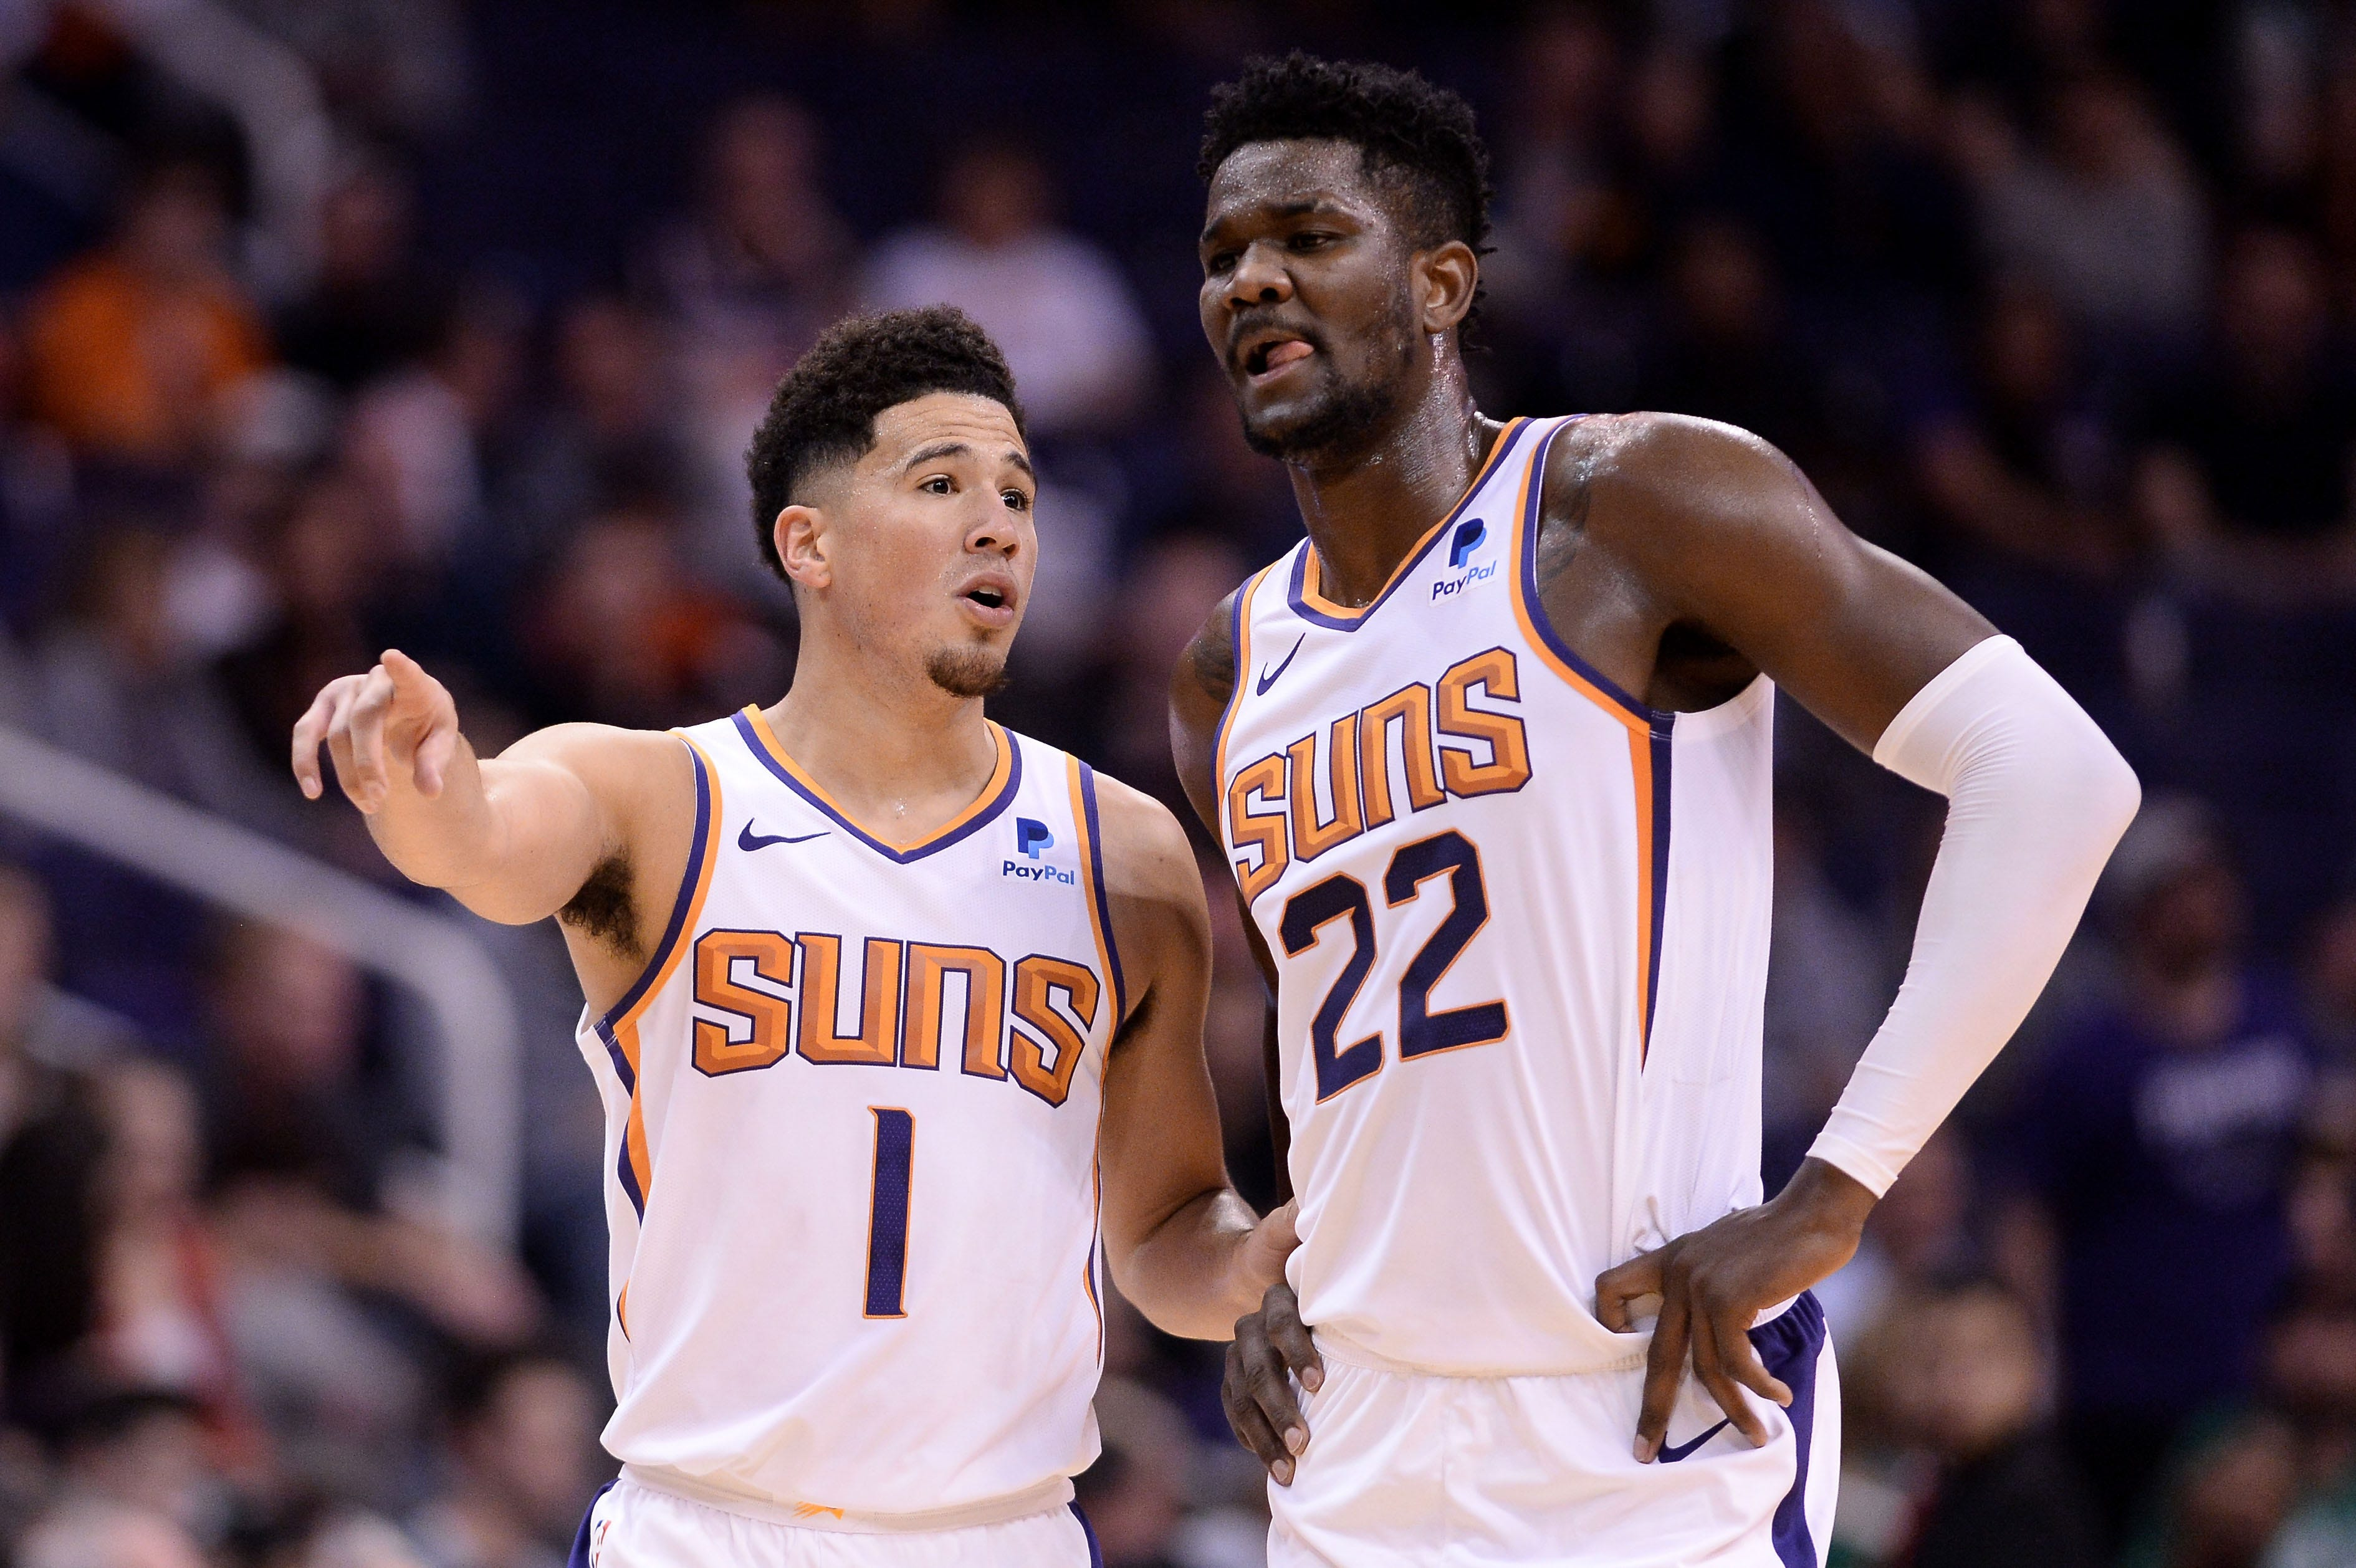 Devin Booker beats Deandre Ayton in all-Phoenix Suns final of NBA 2K Players Tournament